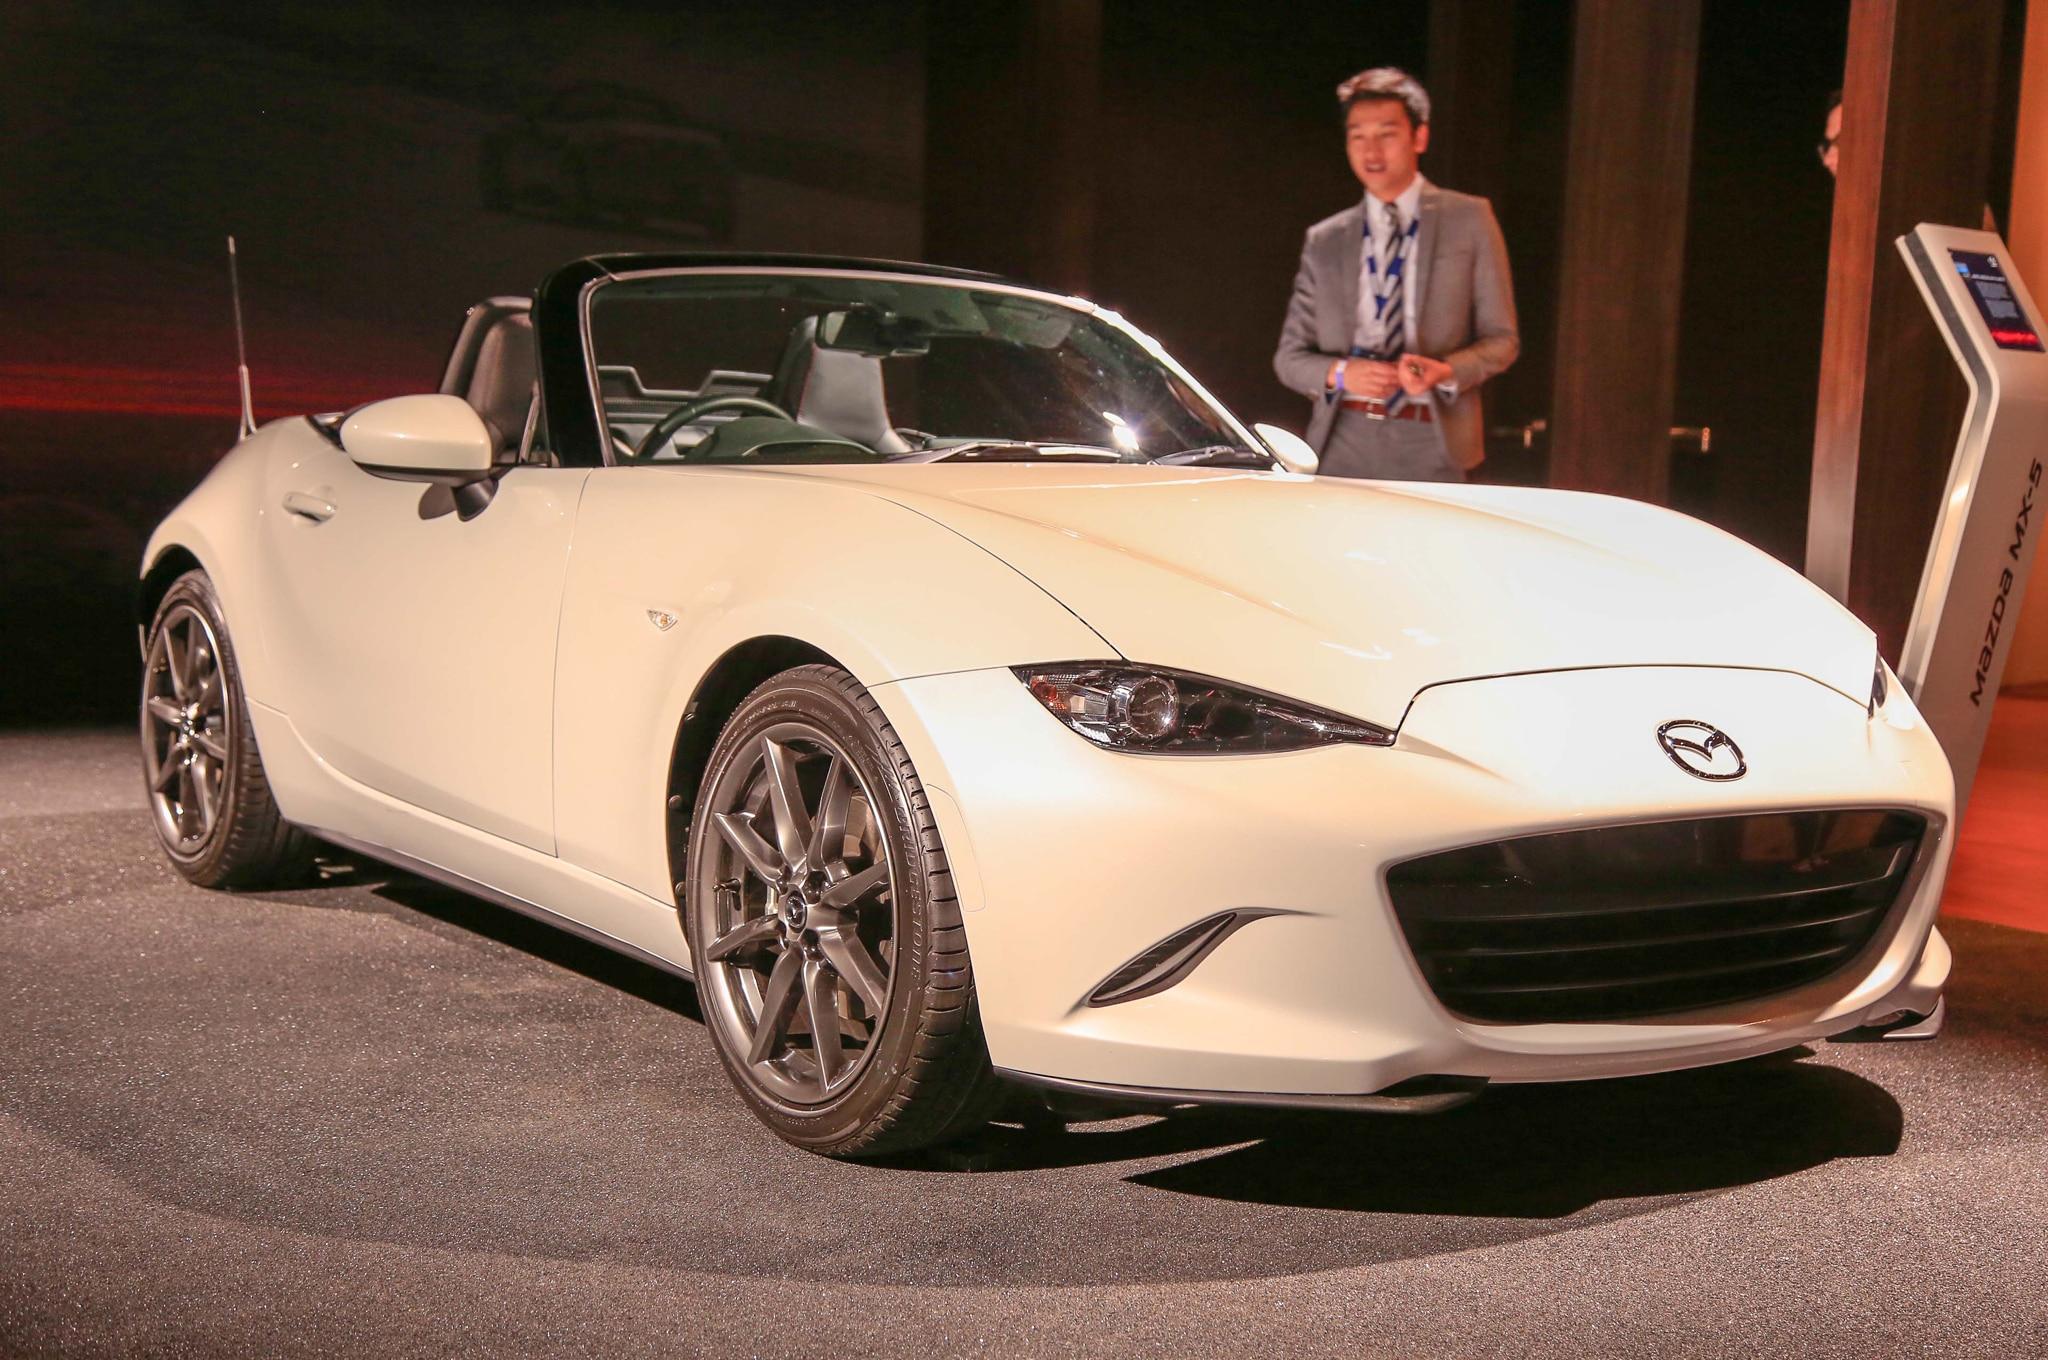 2016 Mazda MX-5 Miata Revealed